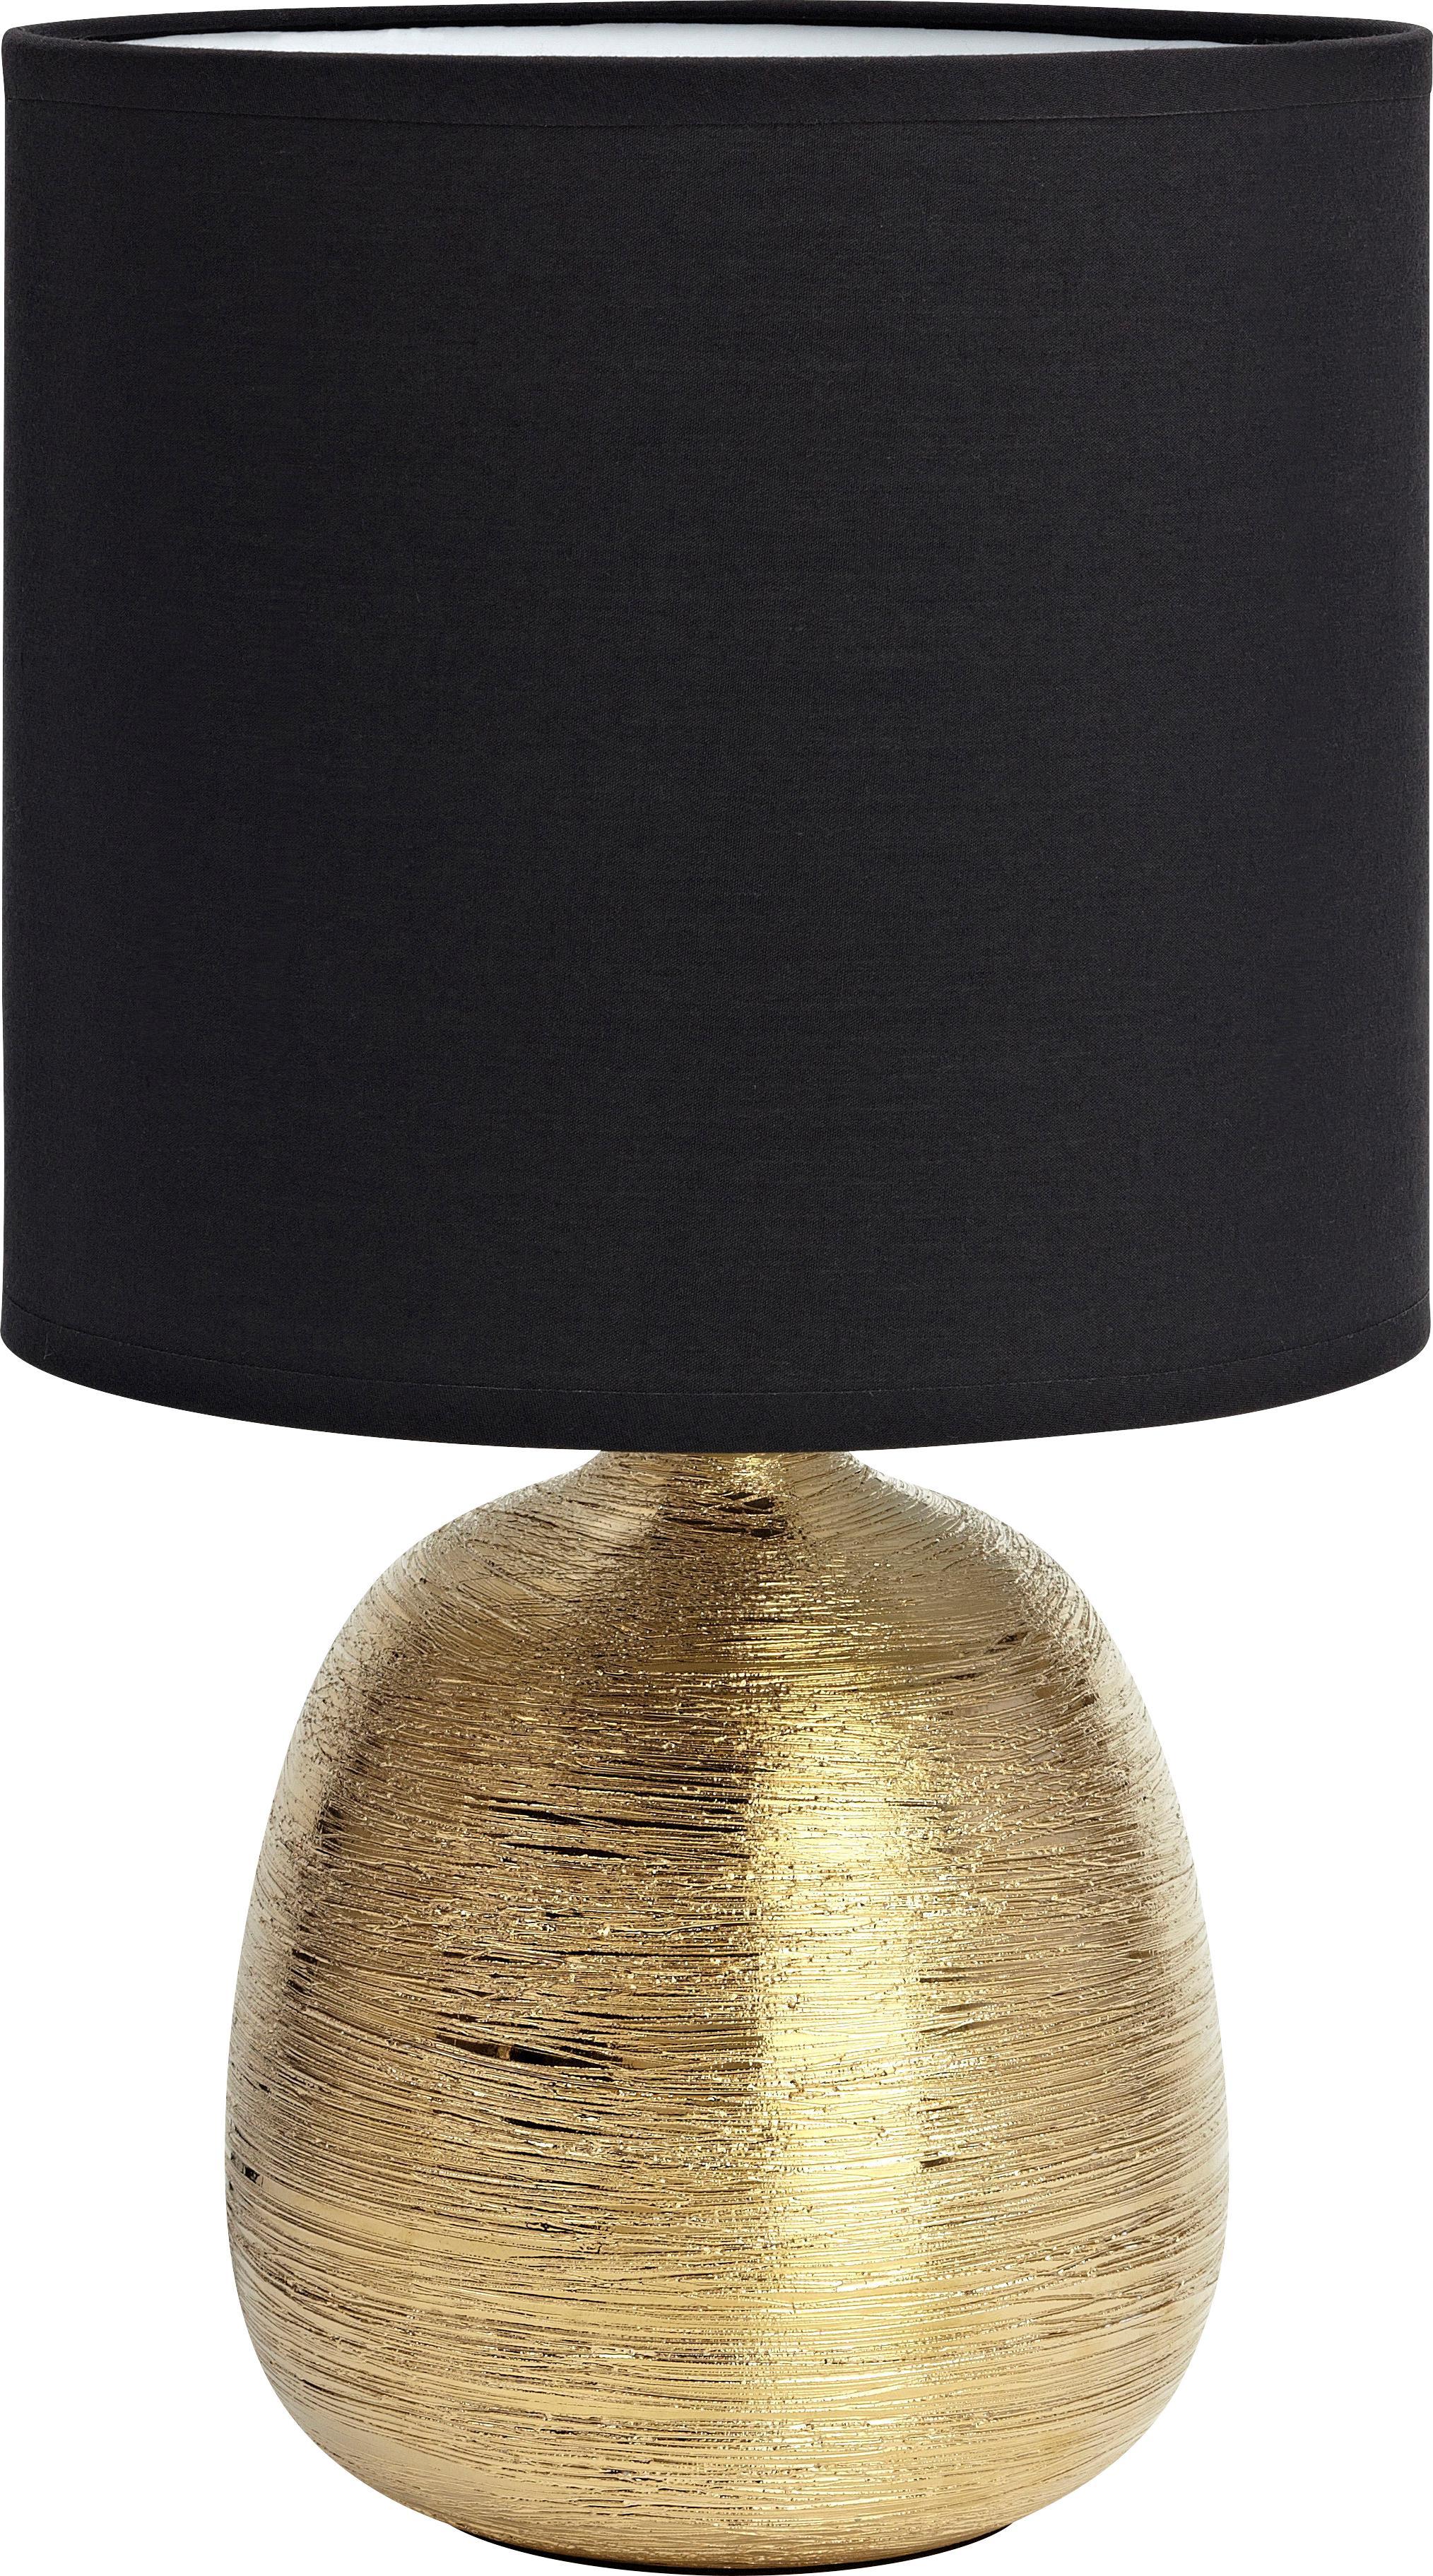 Keramik-Tischleuchte Oscar in Schwarz-Gold, Lampenfuß: Keramik, Schwarz, Goldfarben, Ø 20 x H 39 cm